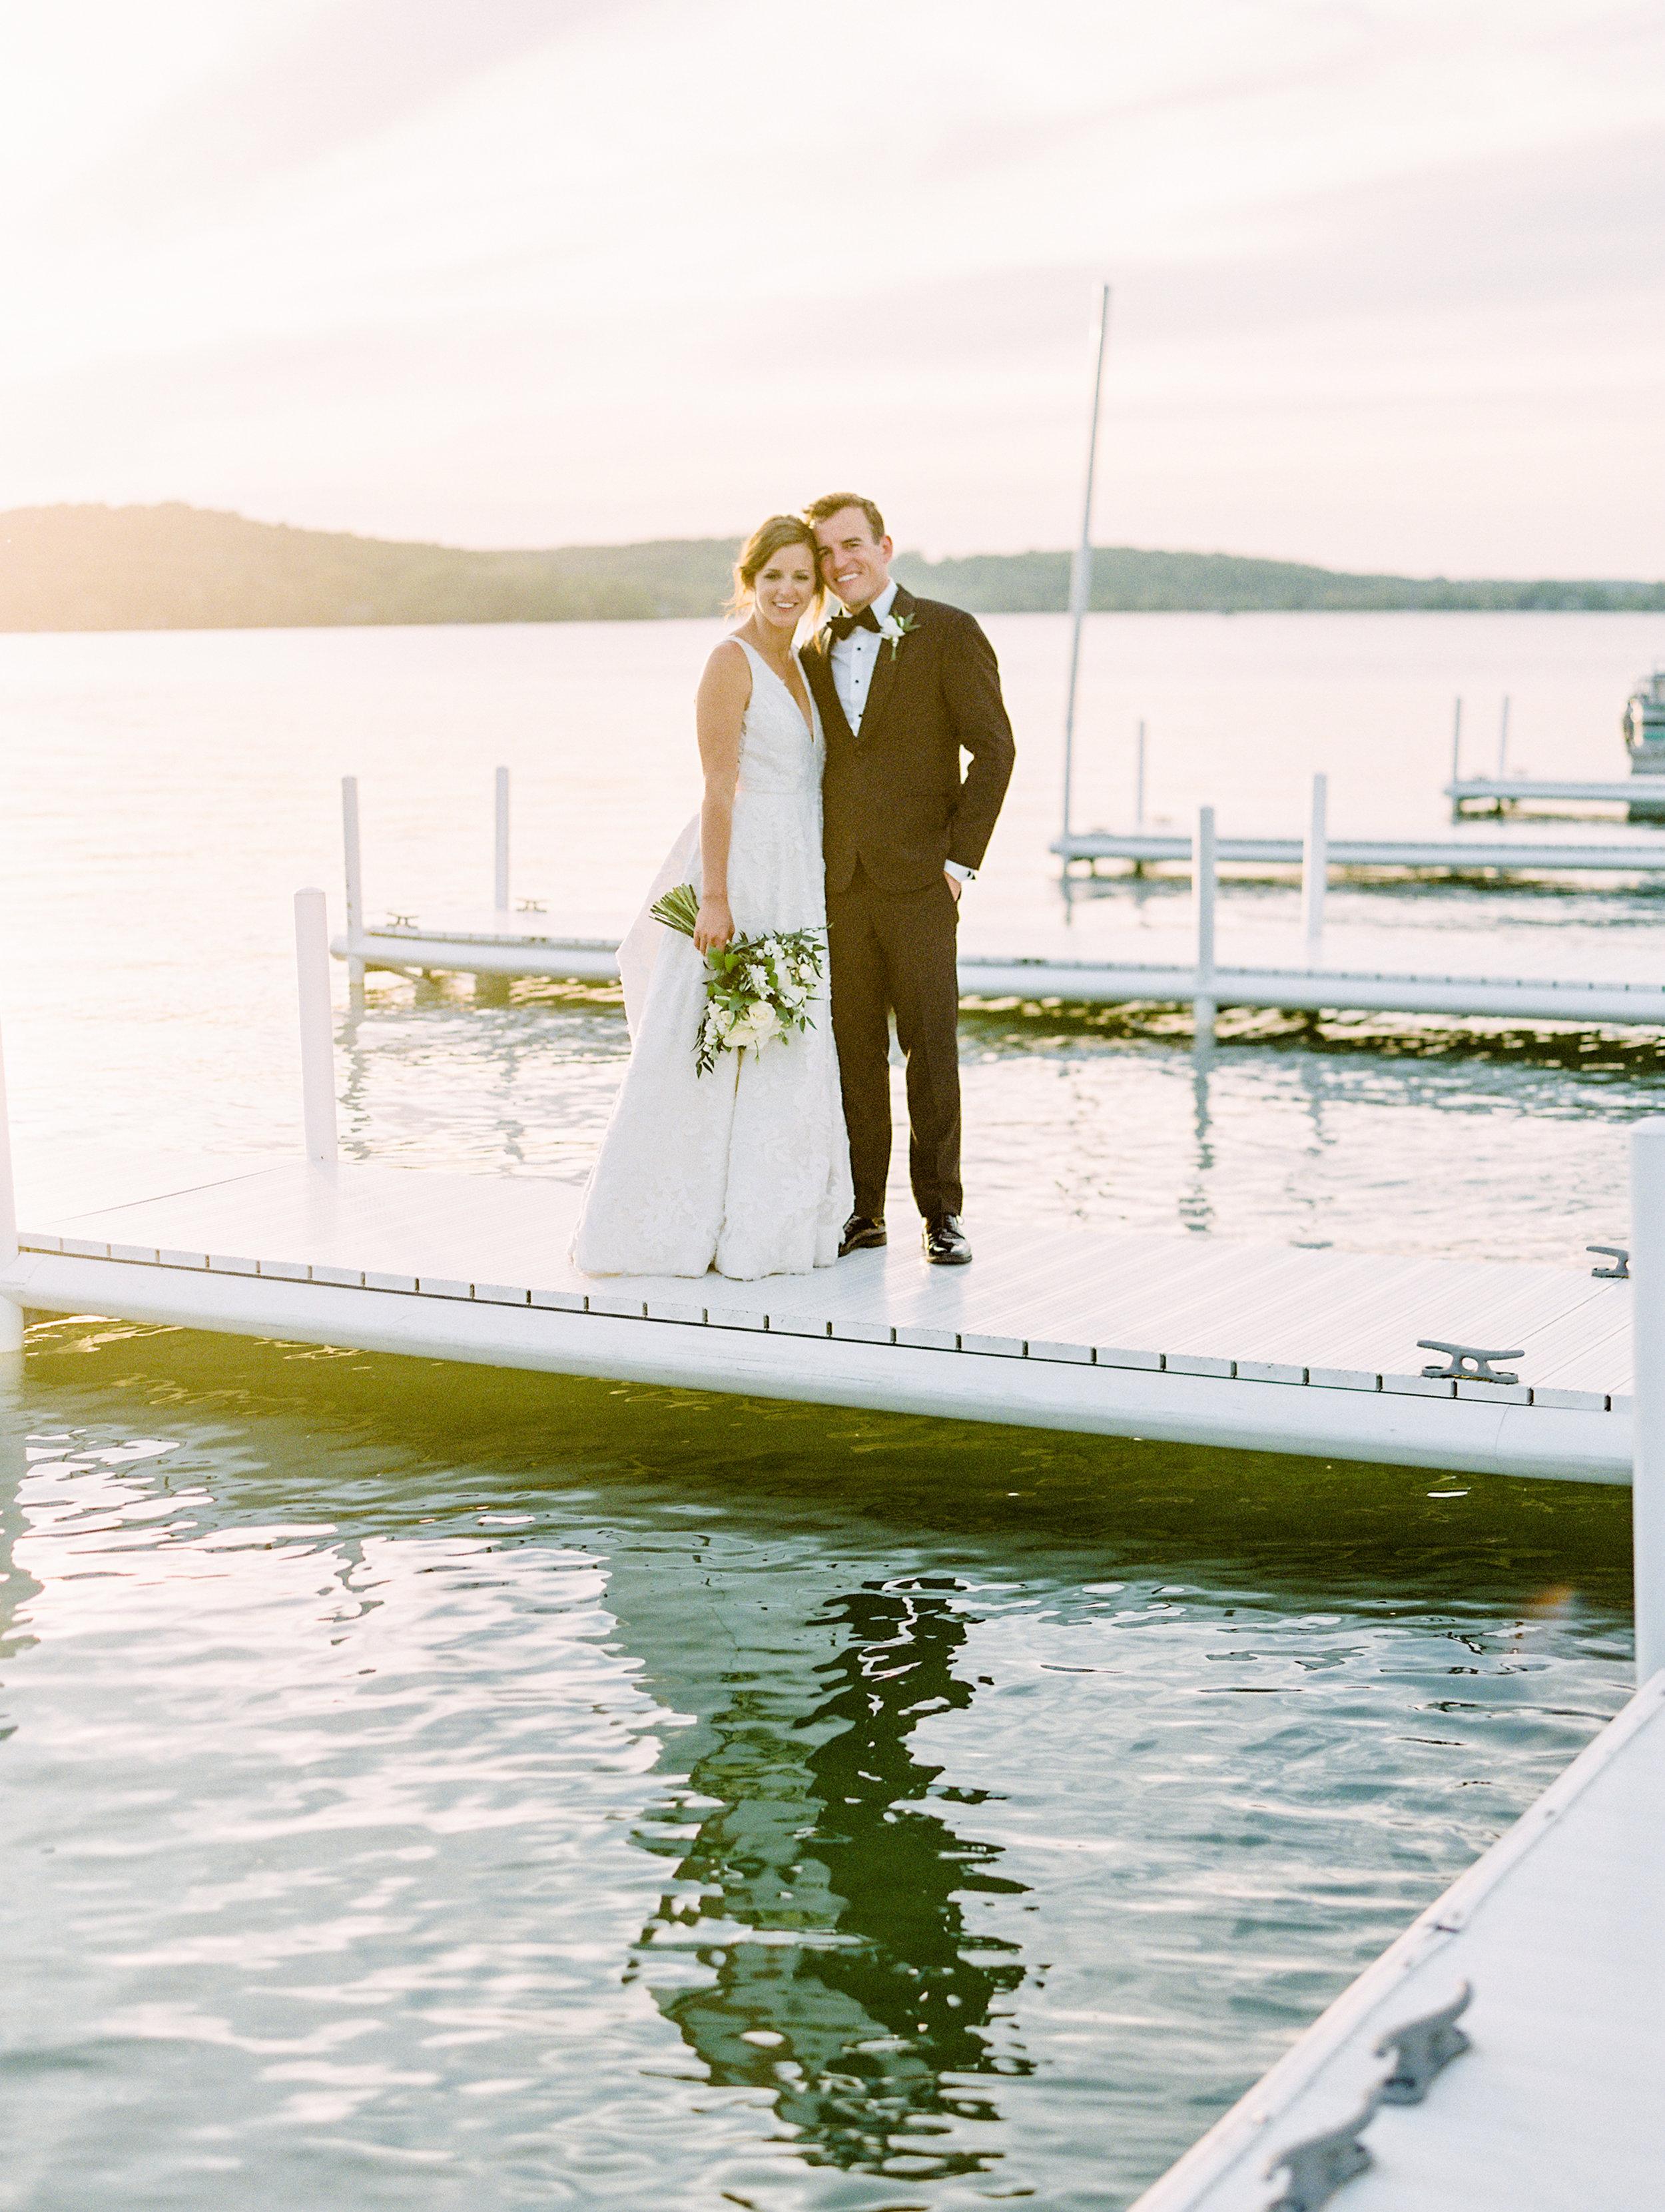 DeGuilio+Wedding+BrideGroomSunsetf-10.jpg